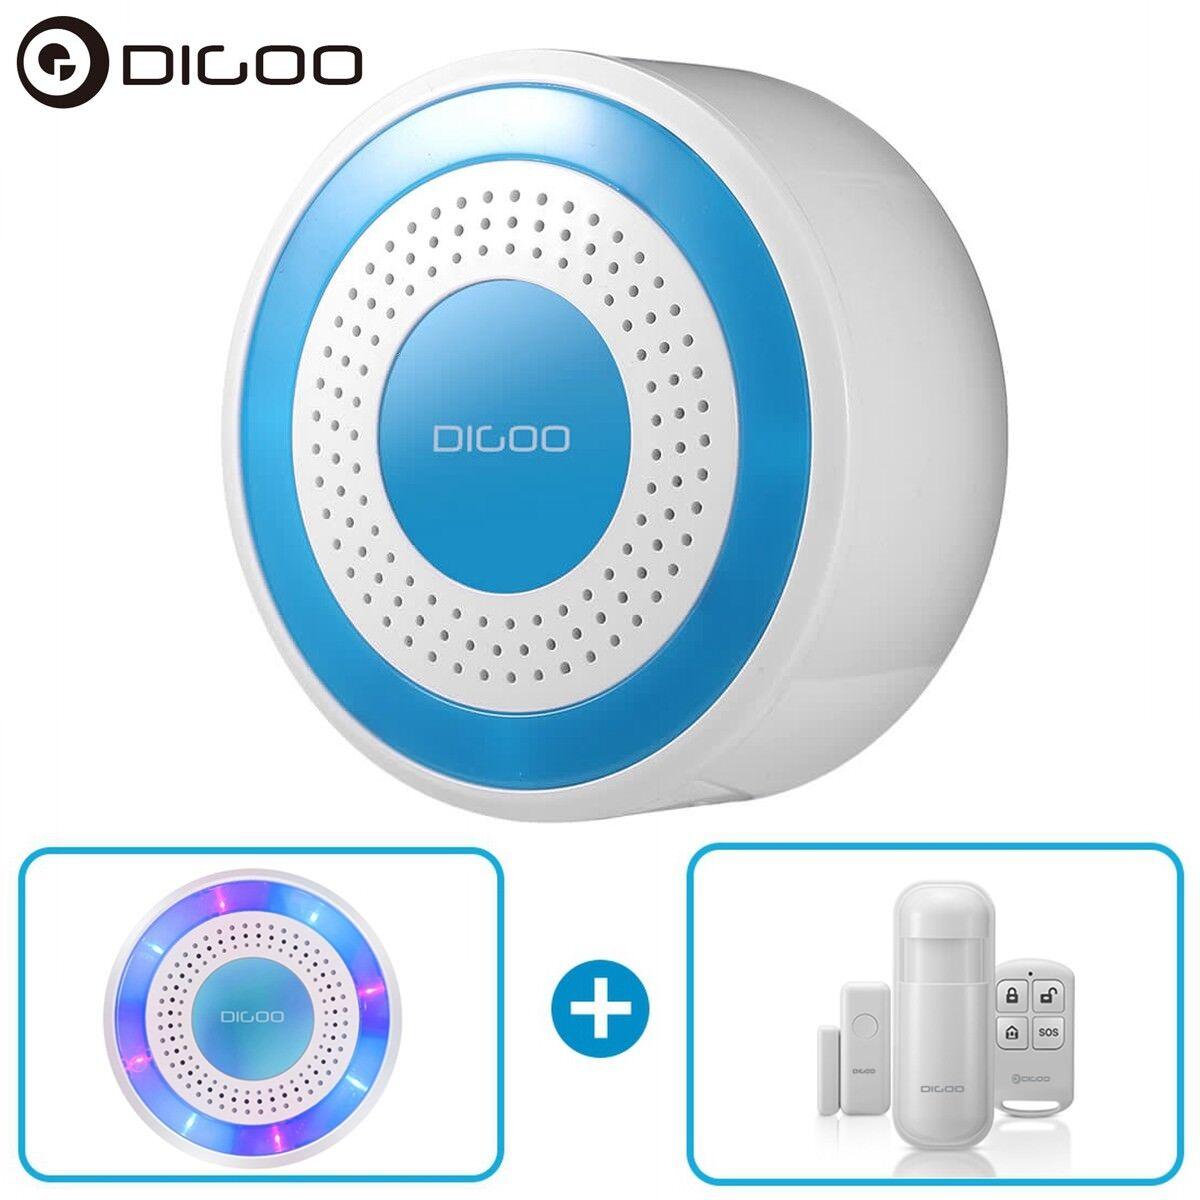 Digoo Wireless Home Security Alarm Standalone Siren Host PIR